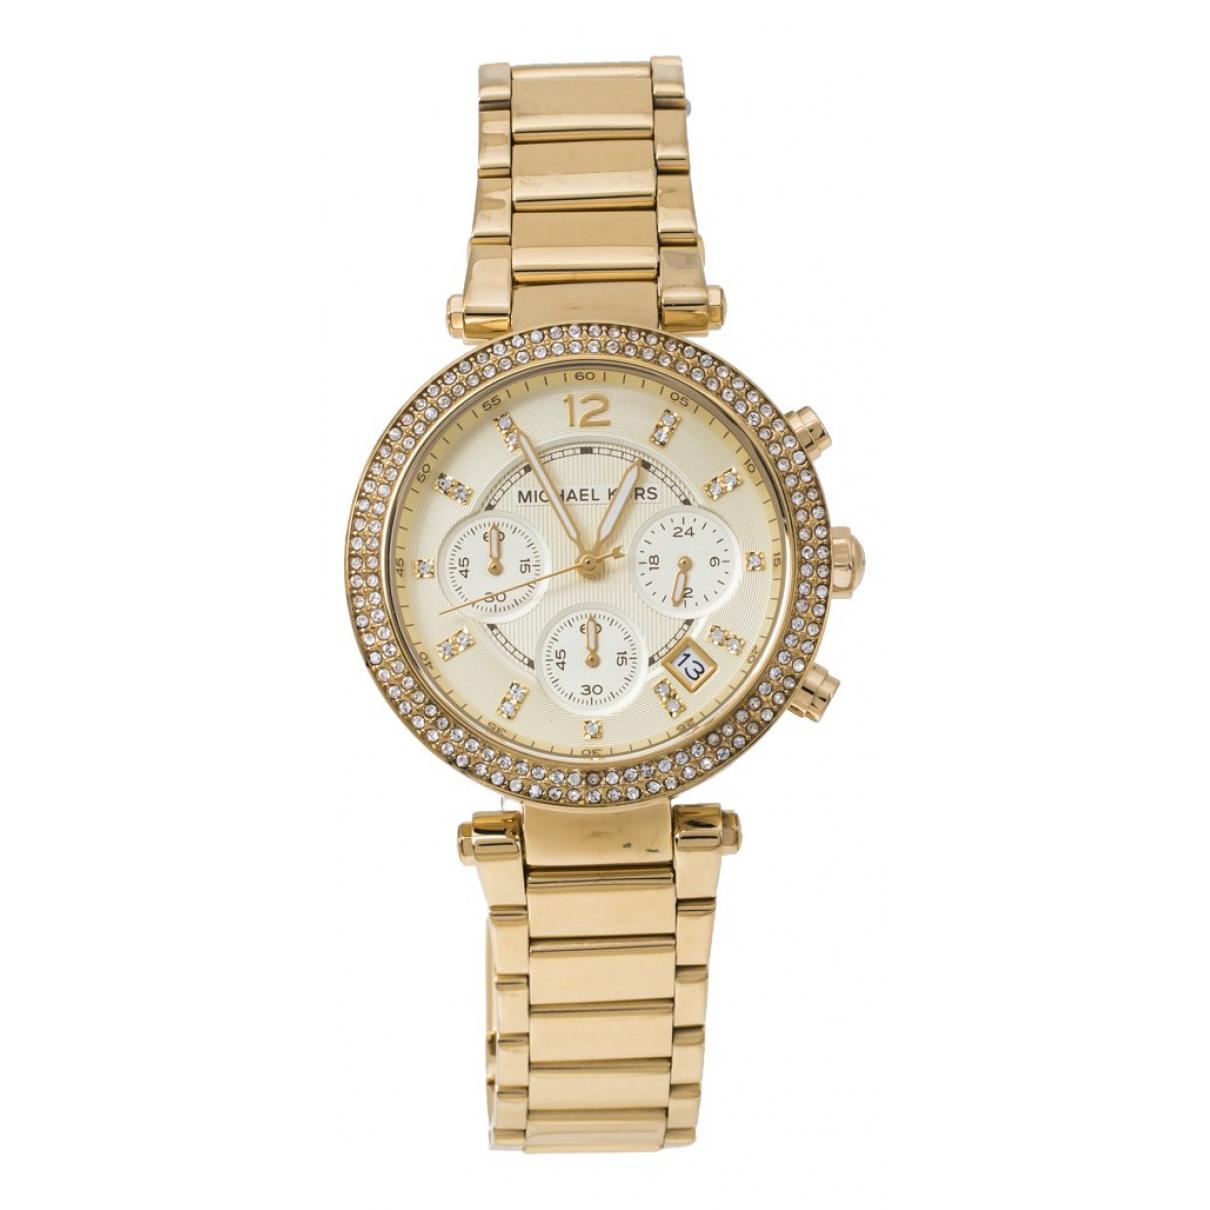 Michael Kors N Gold Steel watch for Women N